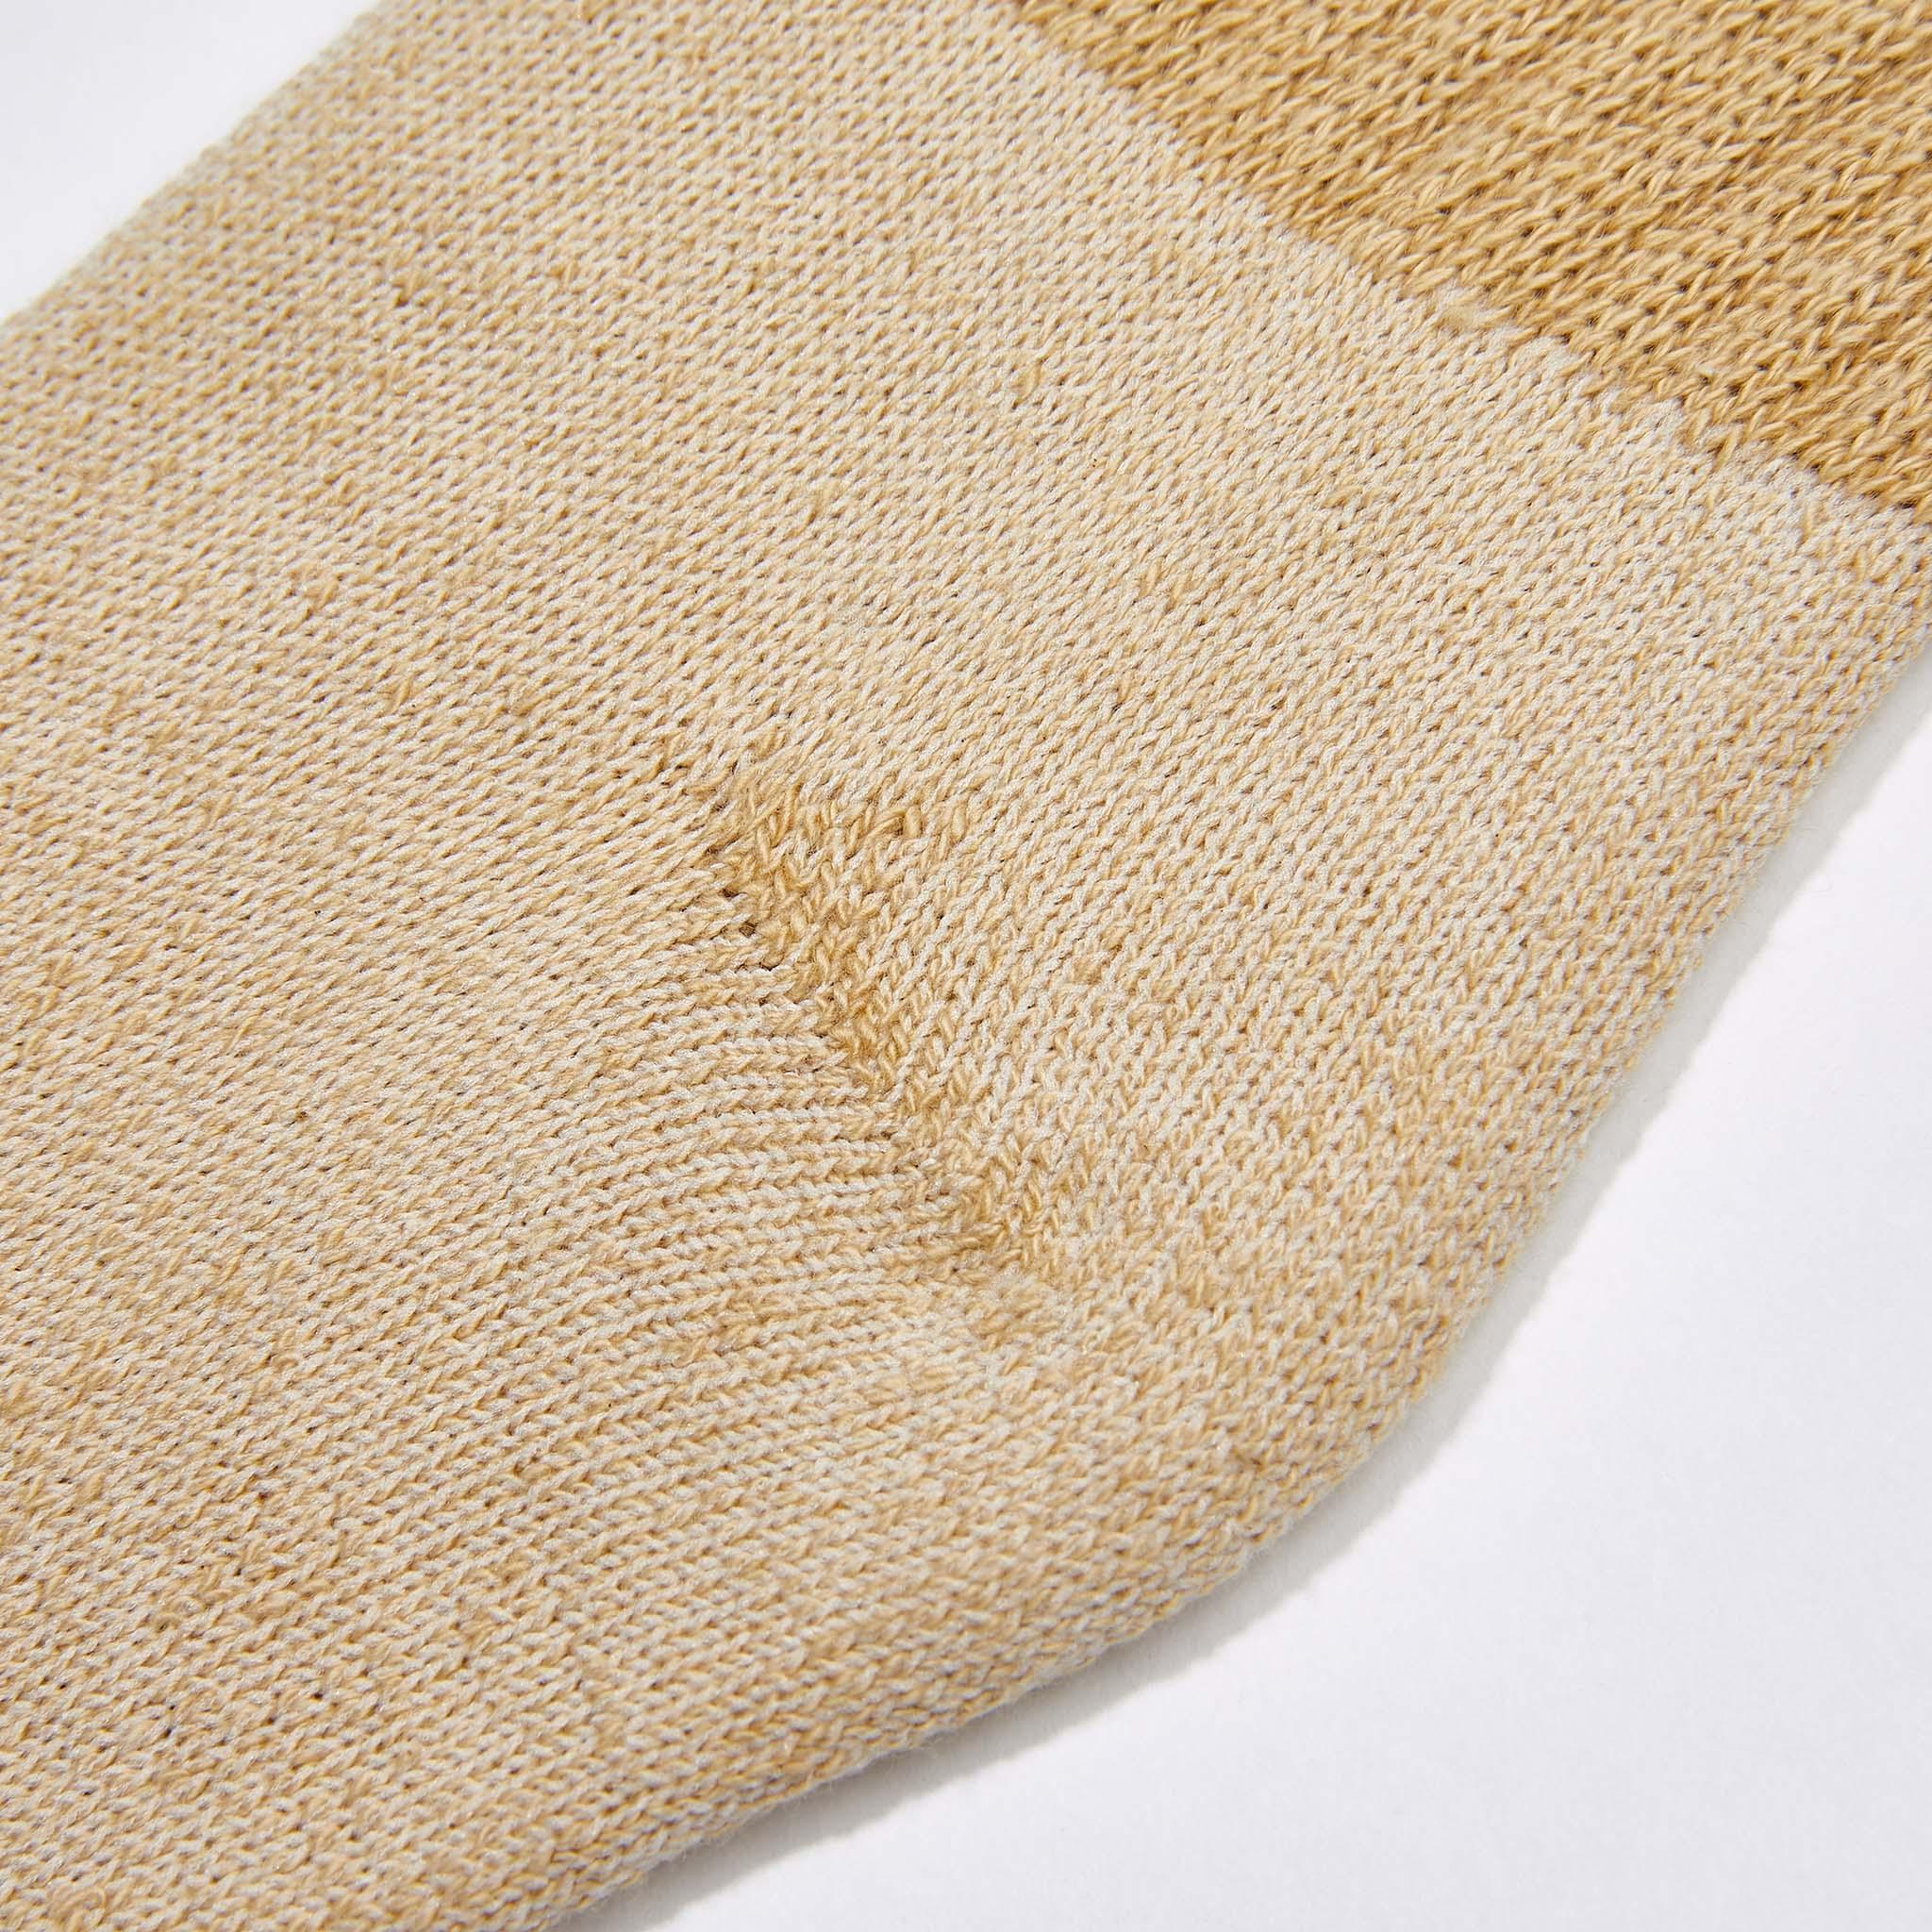 harvest-mill-organic-colorgrown-tan-ankle-sock-5.jpg